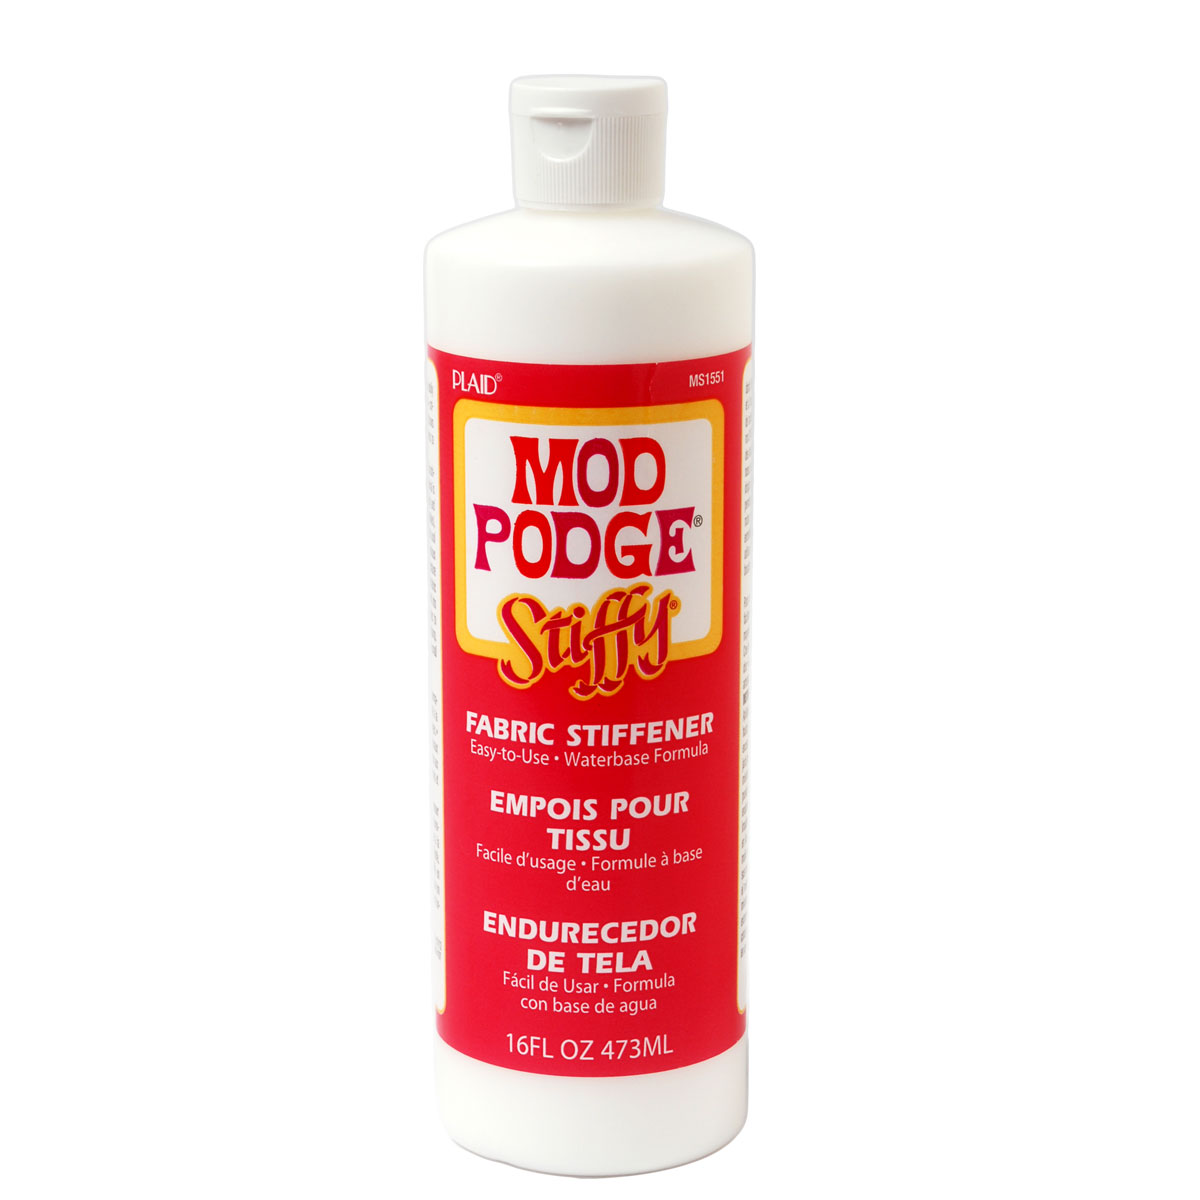 Mod Podge ® Stiffy - 16 oz.